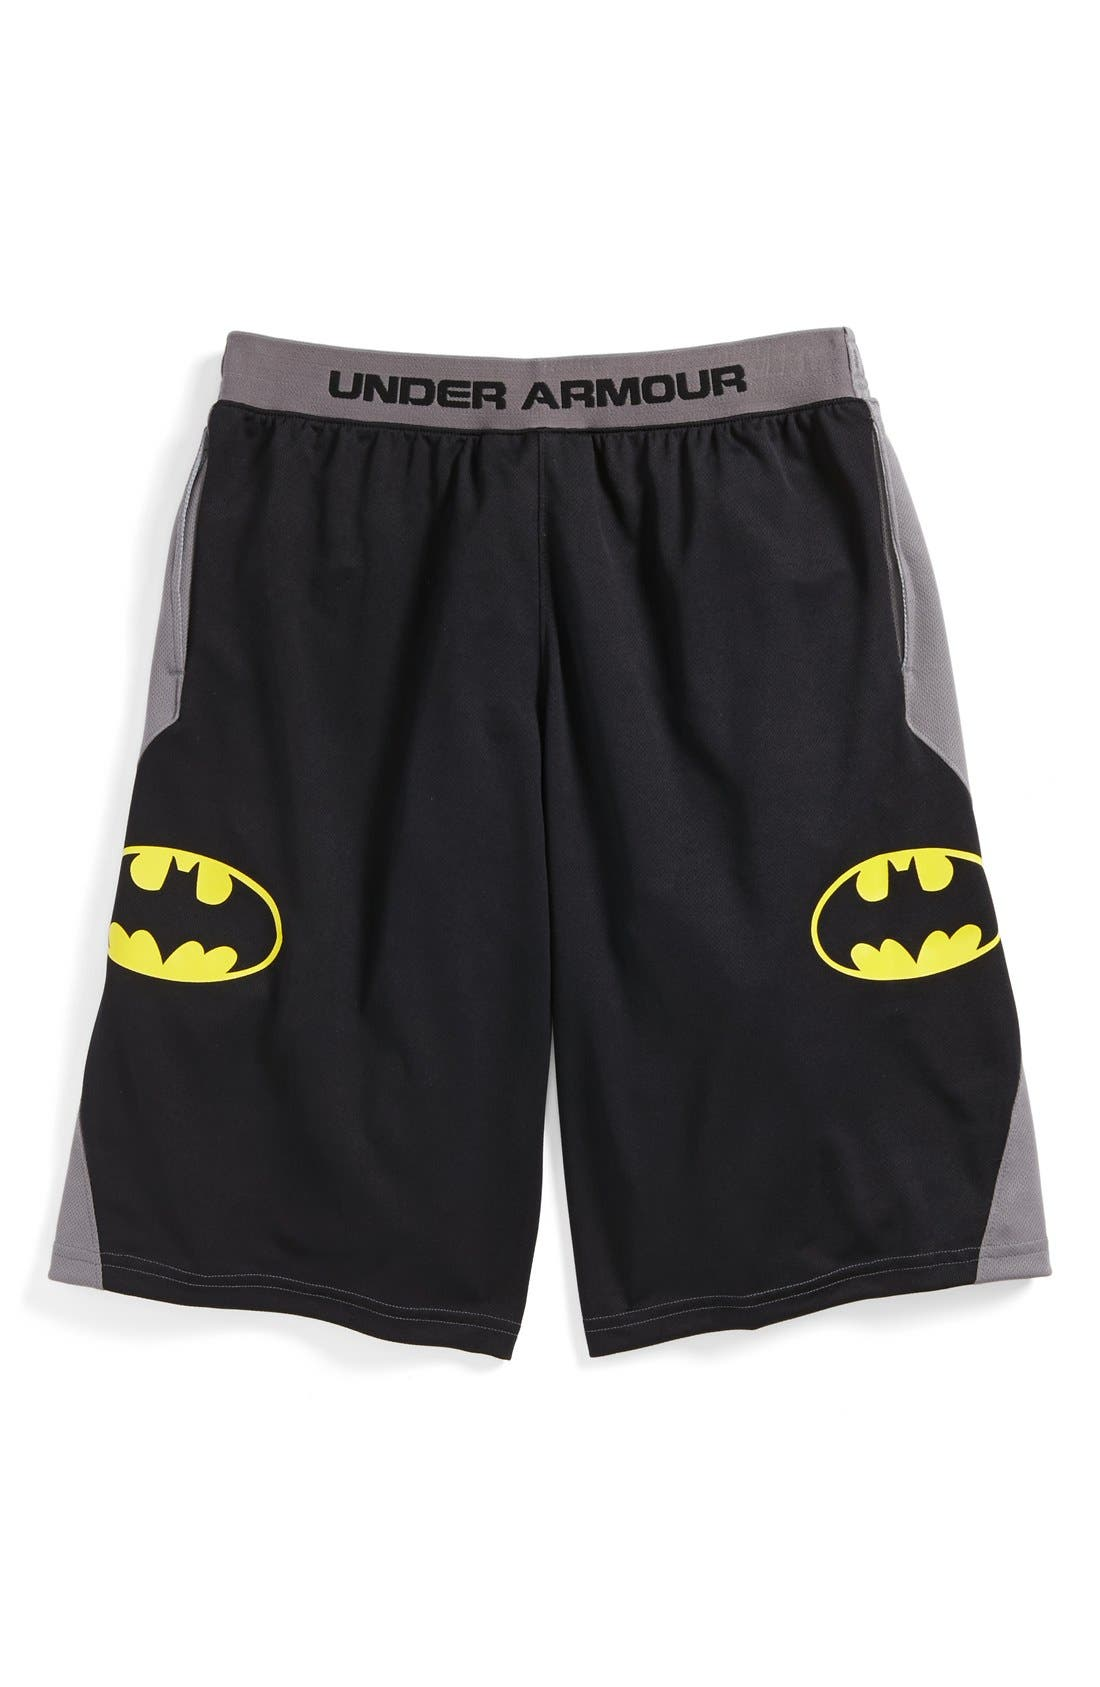 Main Image - Under Armour 'Alter Ego - Batman' Shorts (Little Boys & Big Boys)